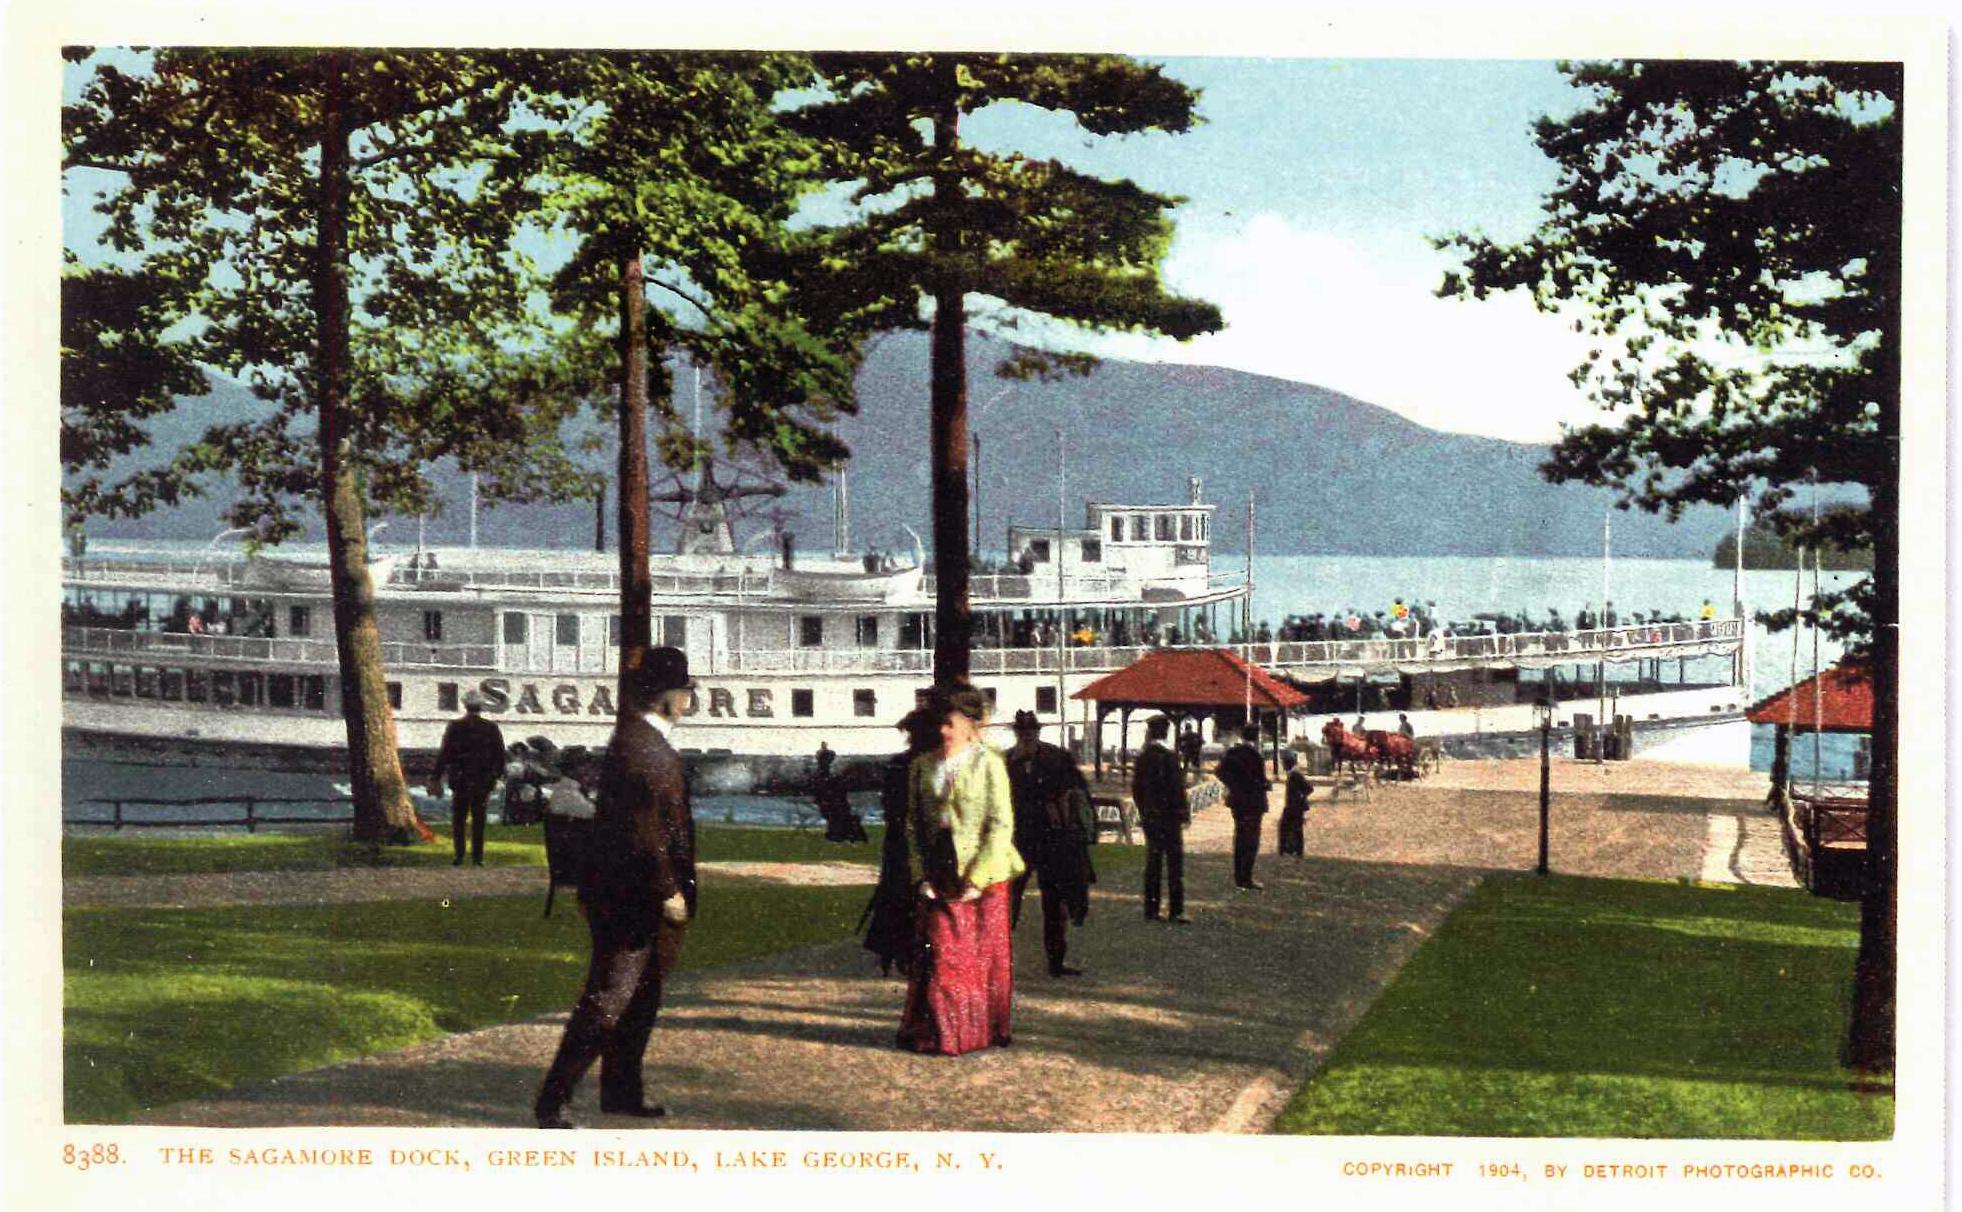 The Sagamore dock, Green Island, Lake George